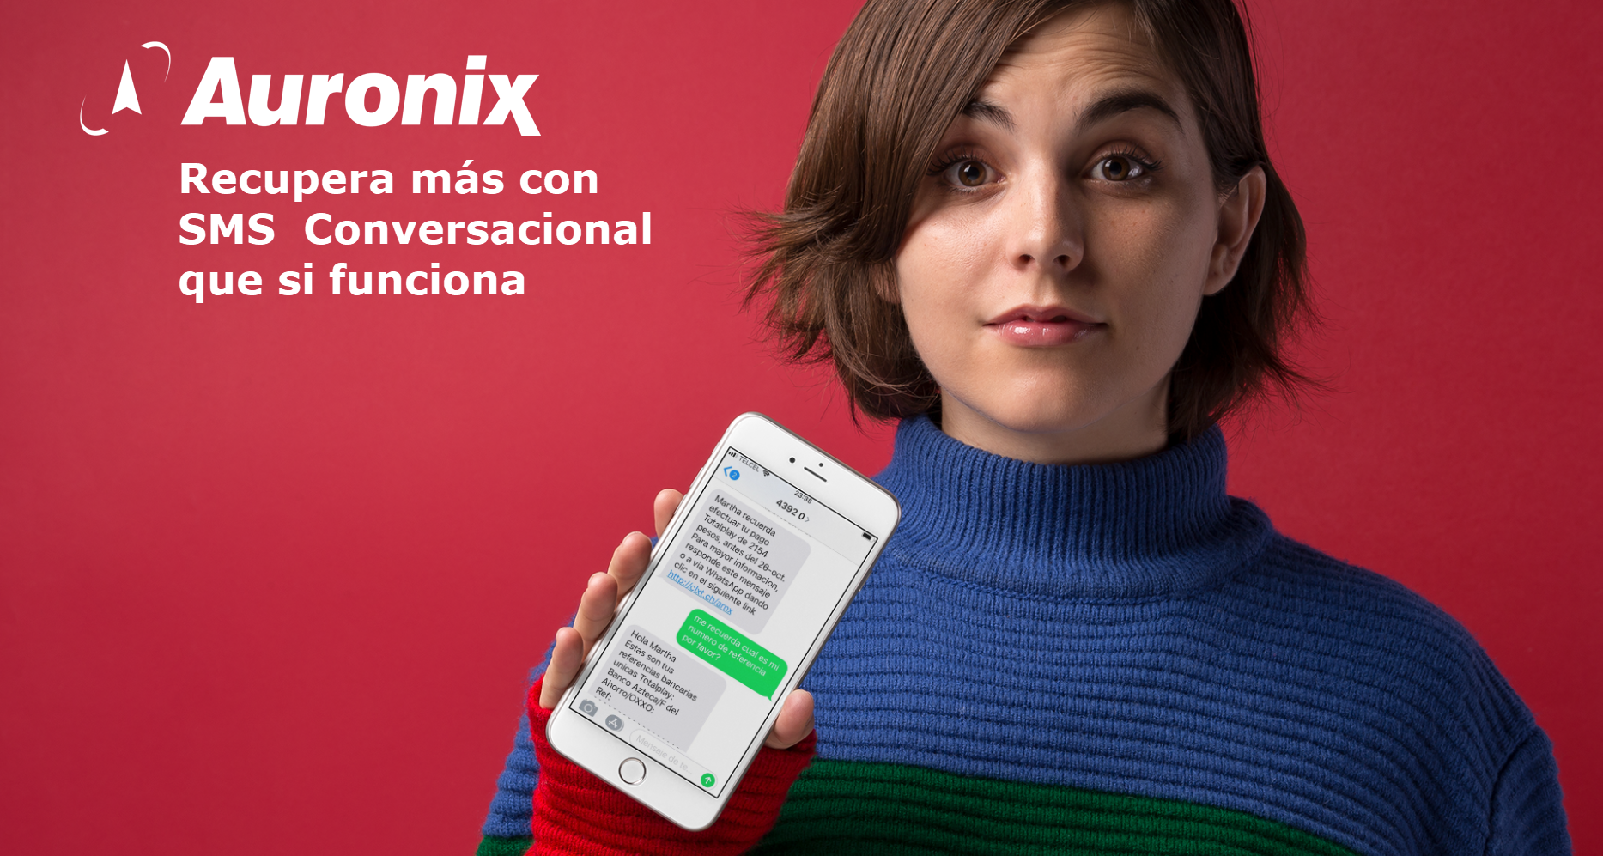 auronix-sms-conversacional-1